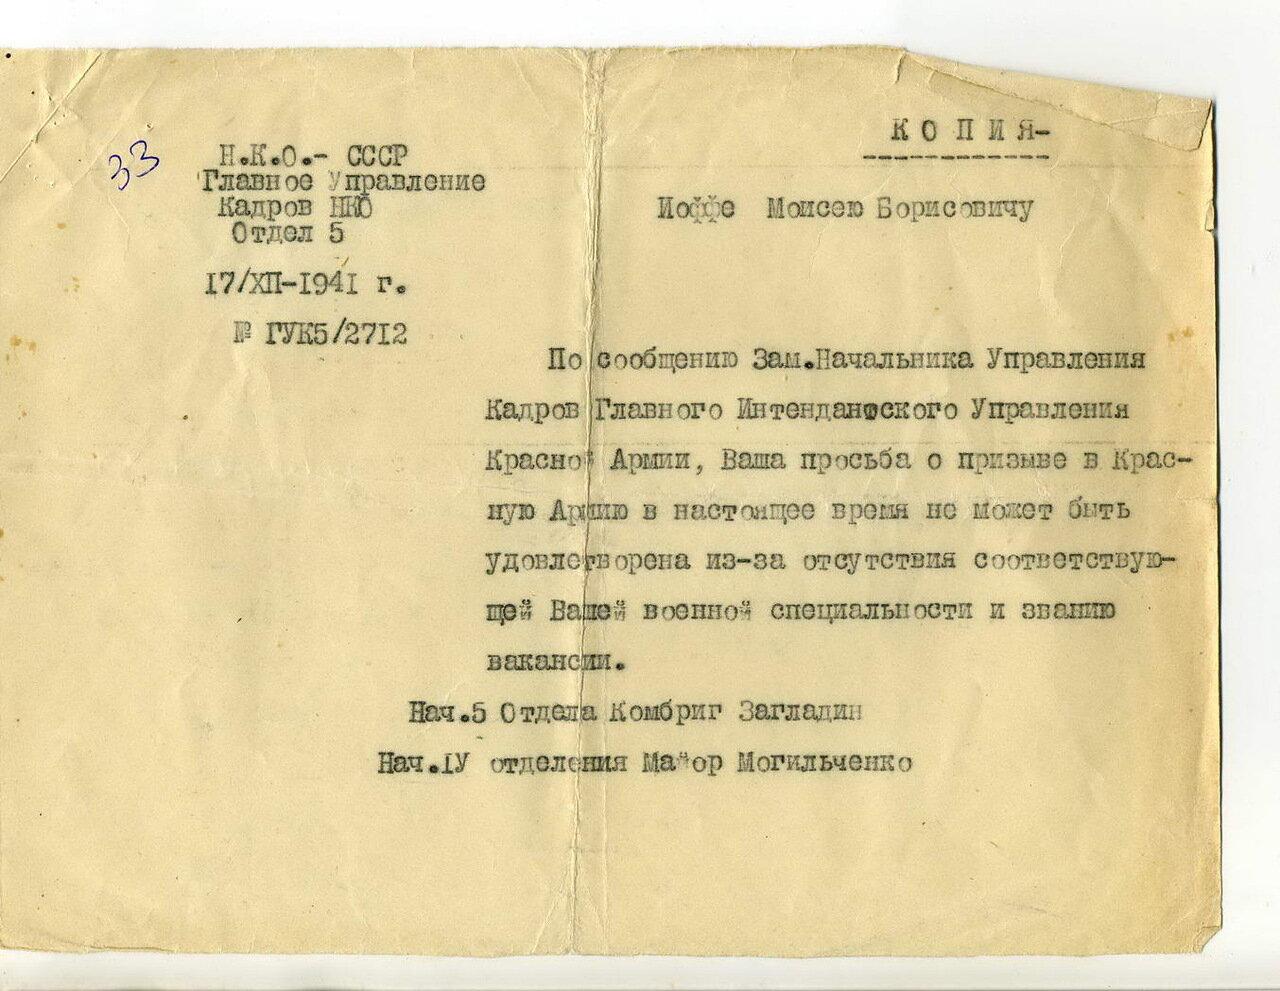 1941, 17 декабря